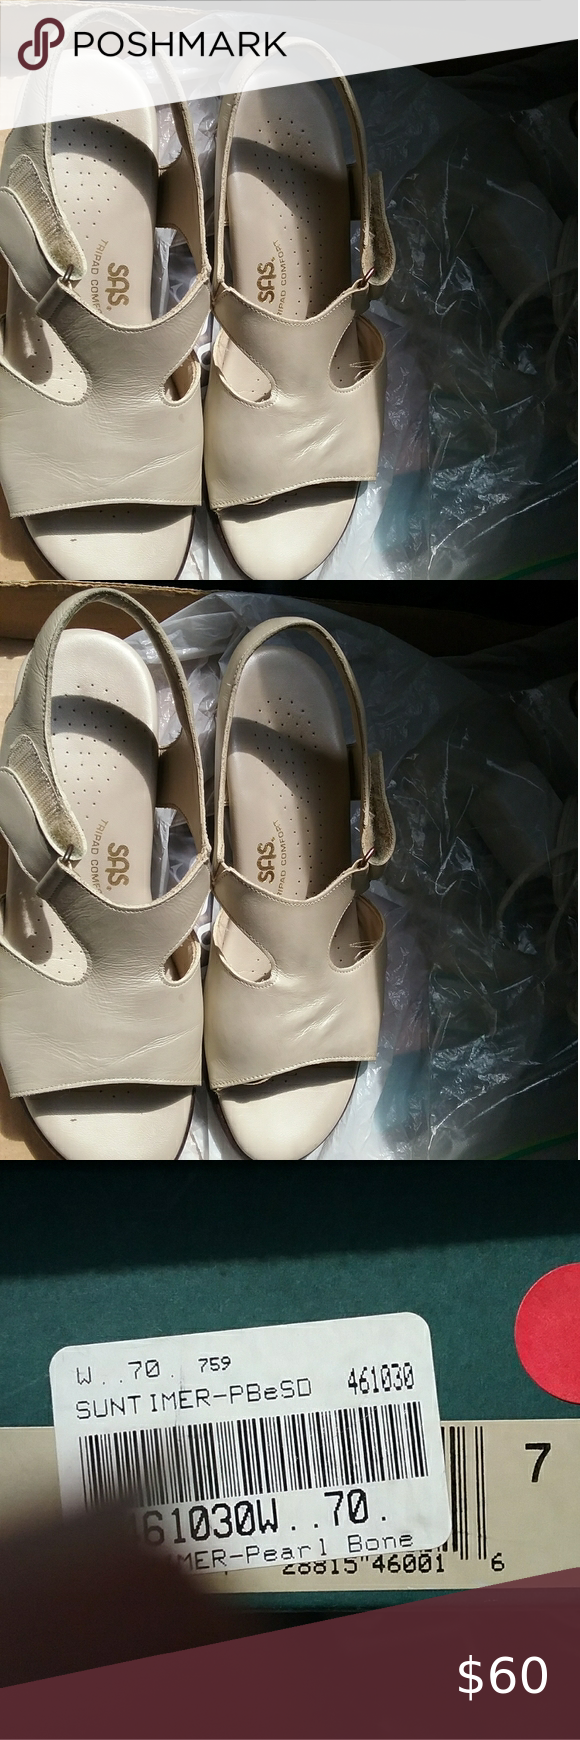 44+ Sas shoes for women ideas ideas in 2021